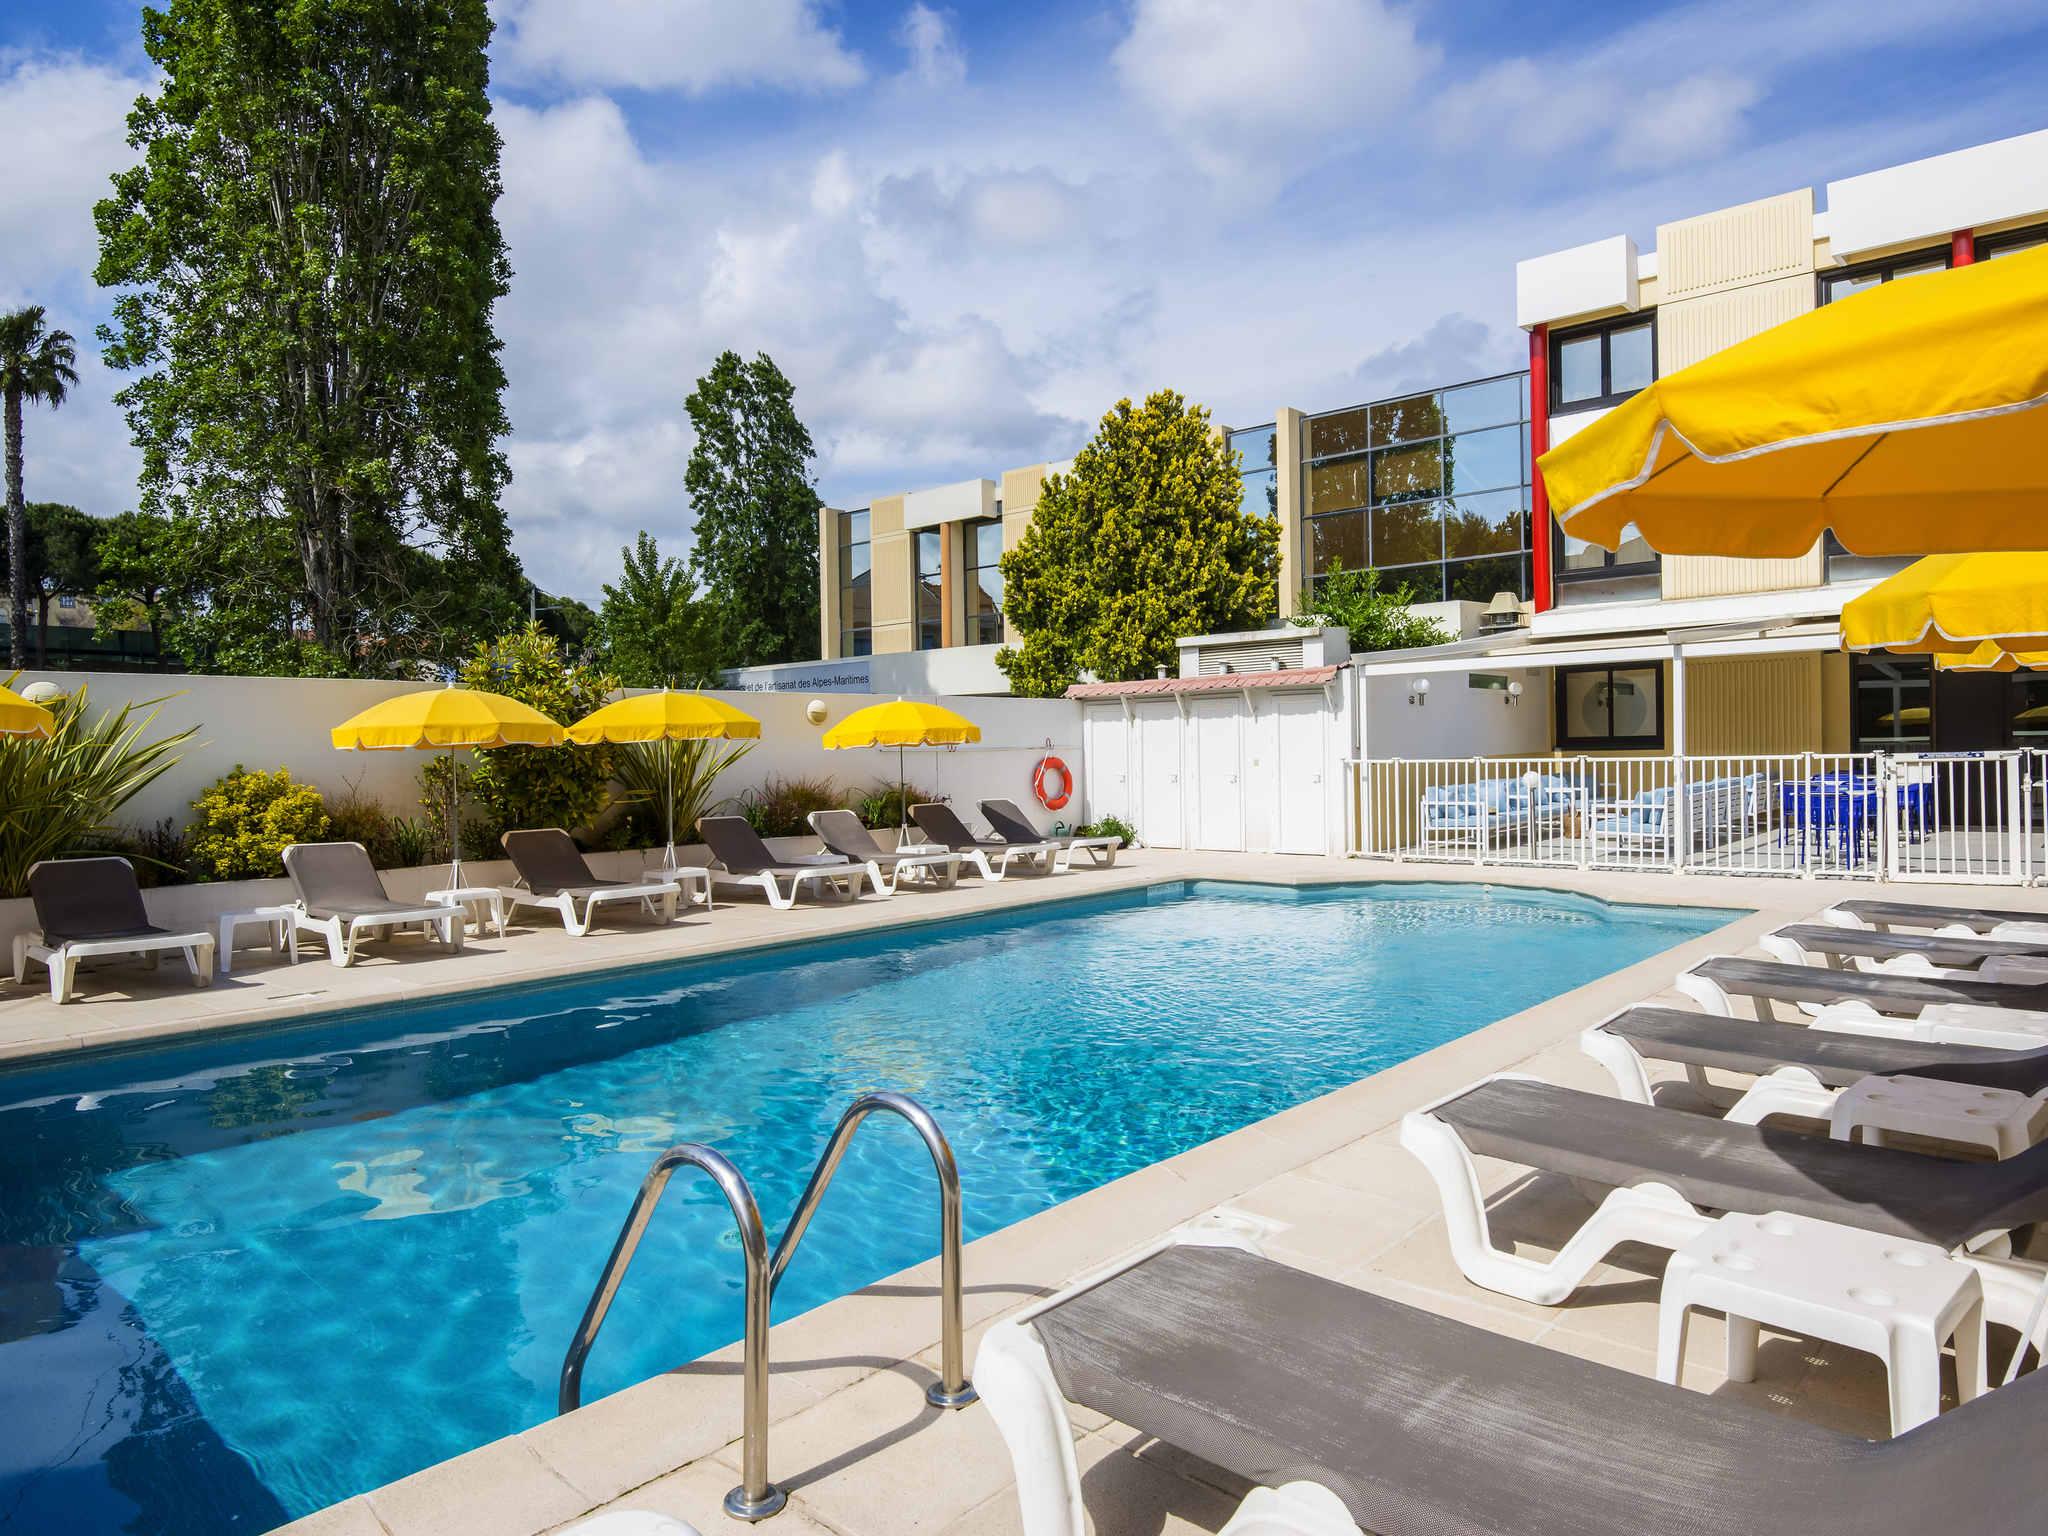 Hotel – HOTEL MERCURE NICE CAP 3000 (Futur Ibis Styles)